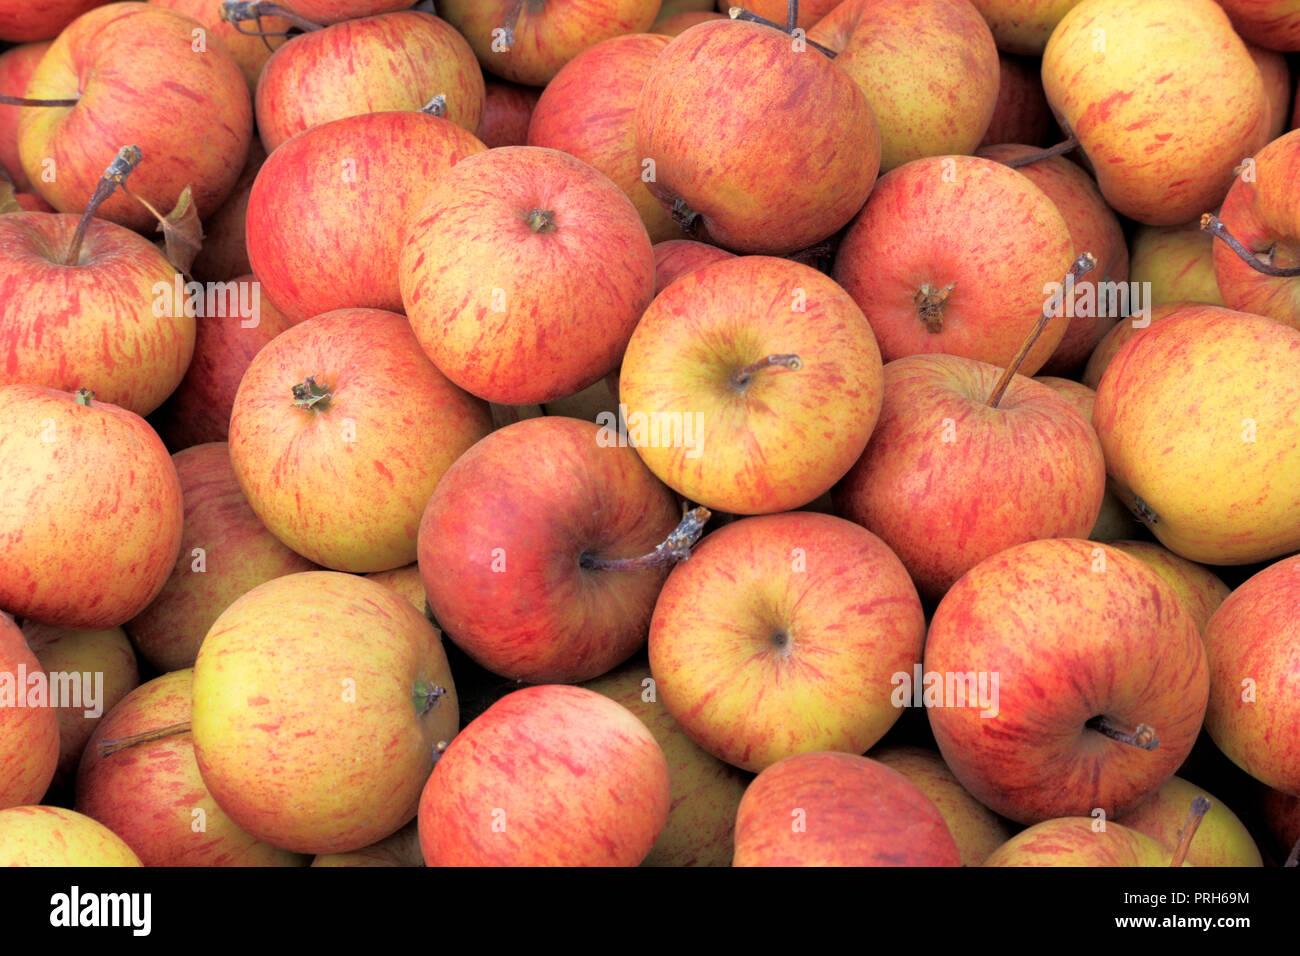 Apple, apples, 'Epicure', malus domestica, farm shop, display, edible, fruit - Stock Image